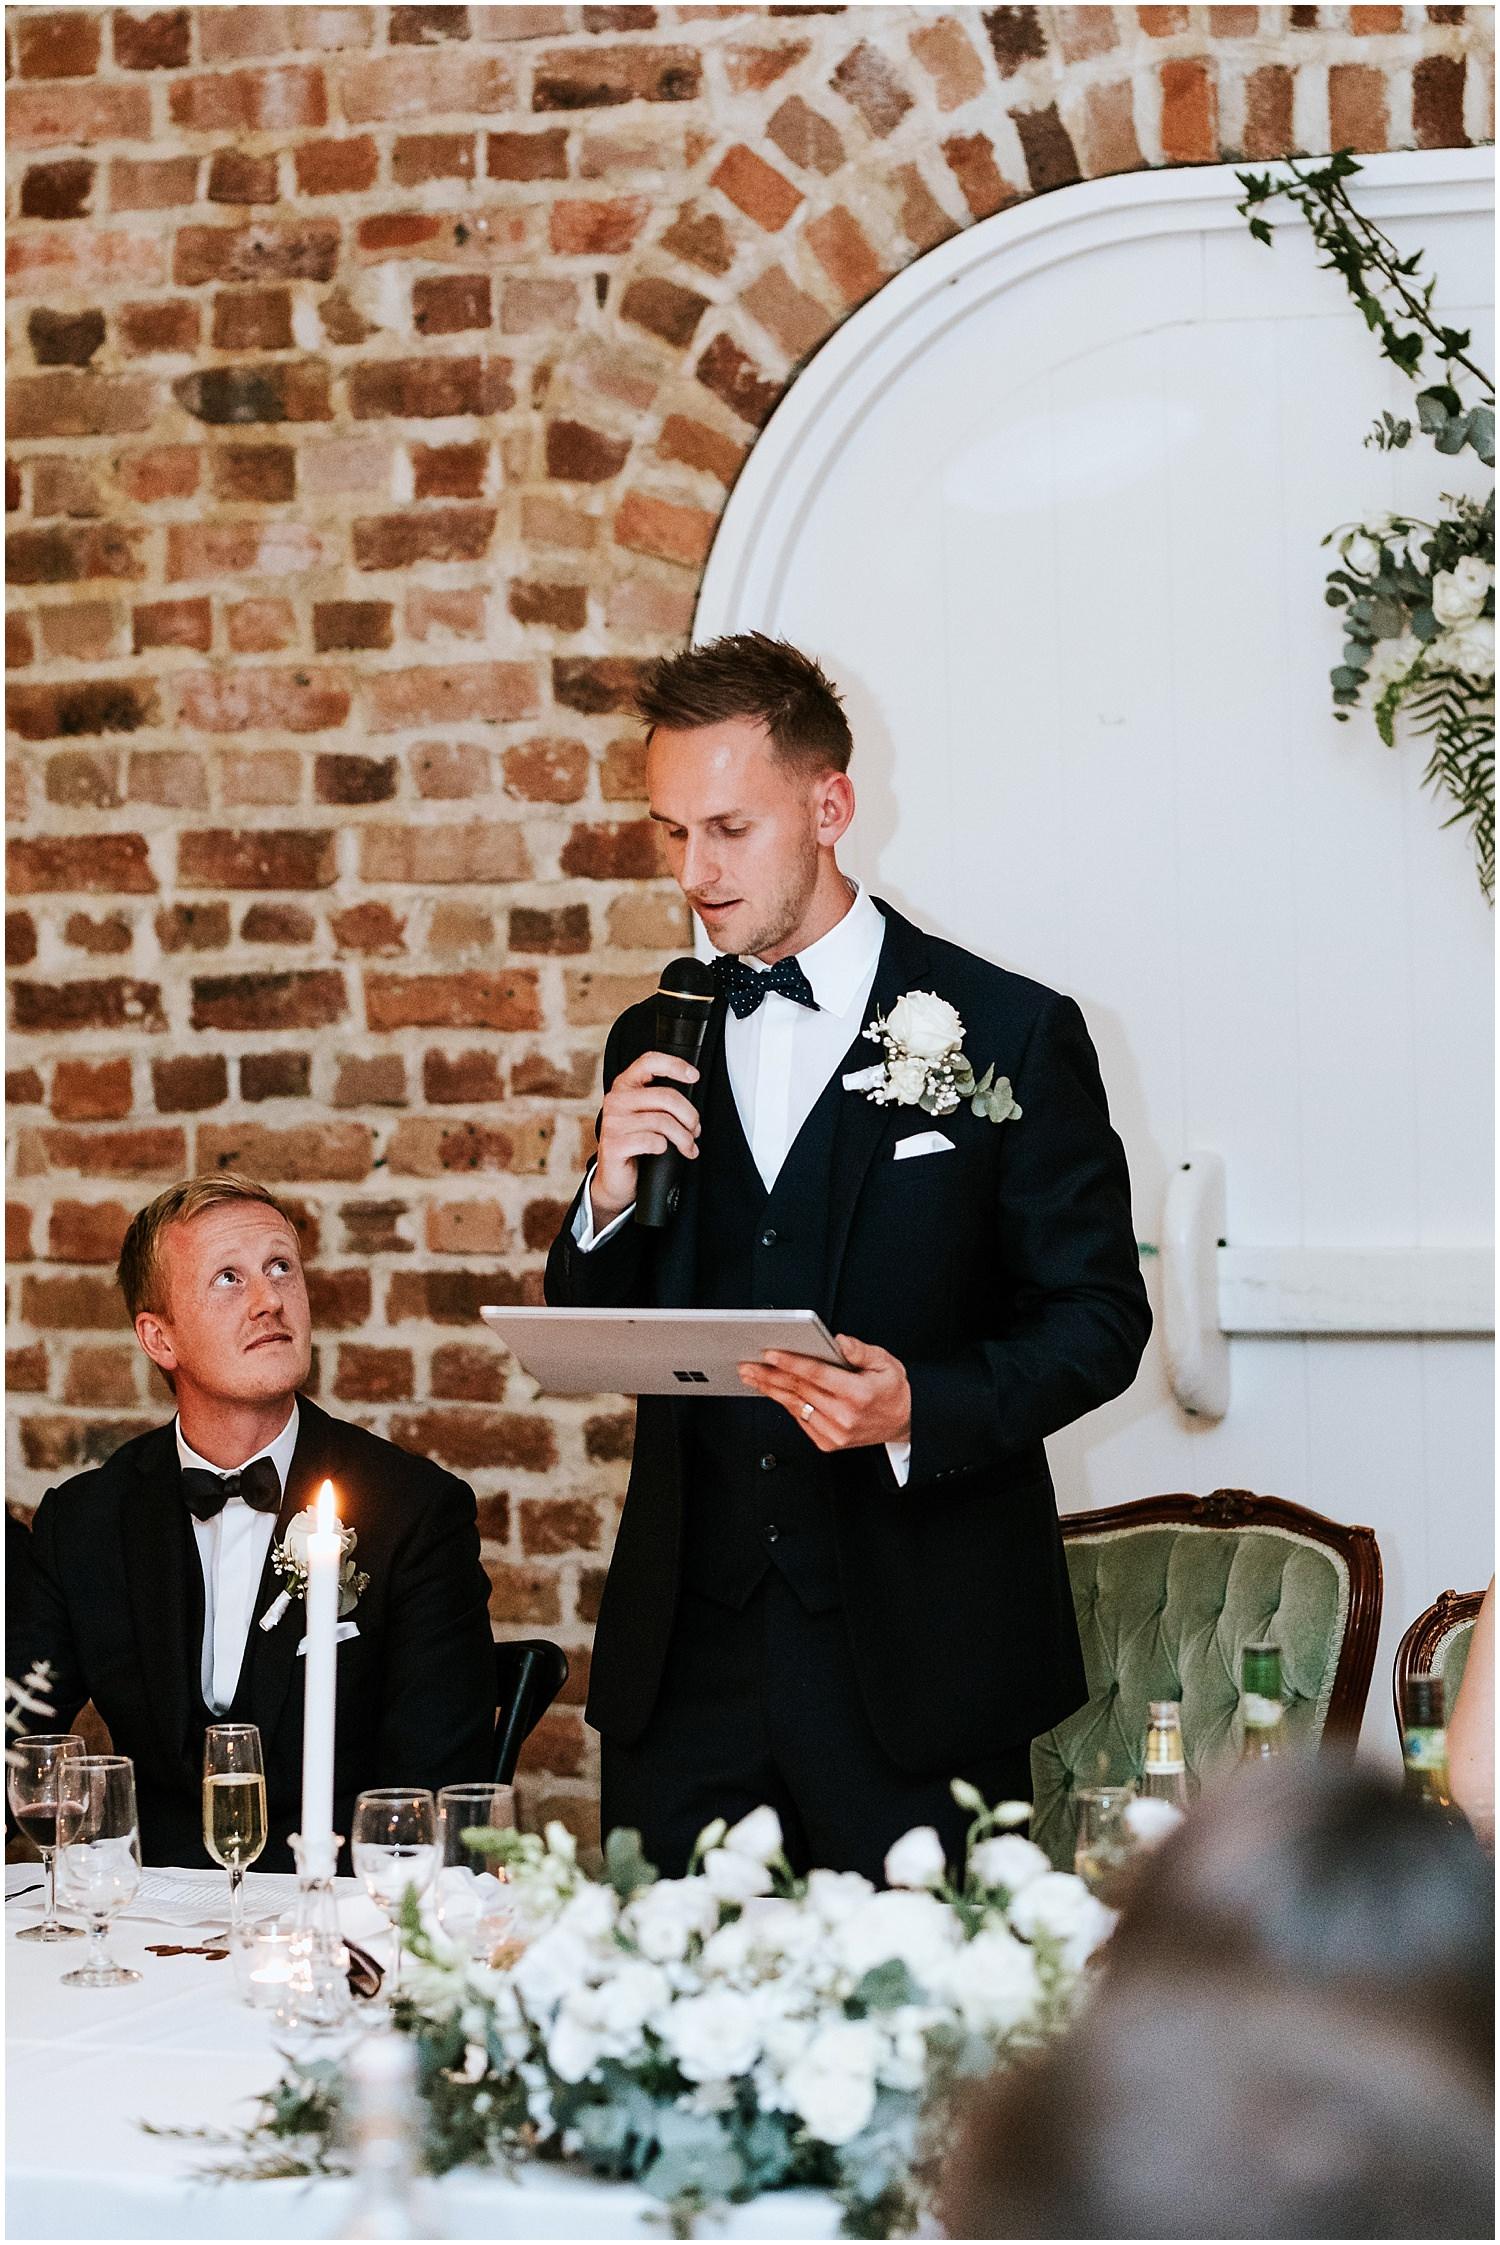 dominique-guy-montrose-berry-farm-wedding-_0089.jpg